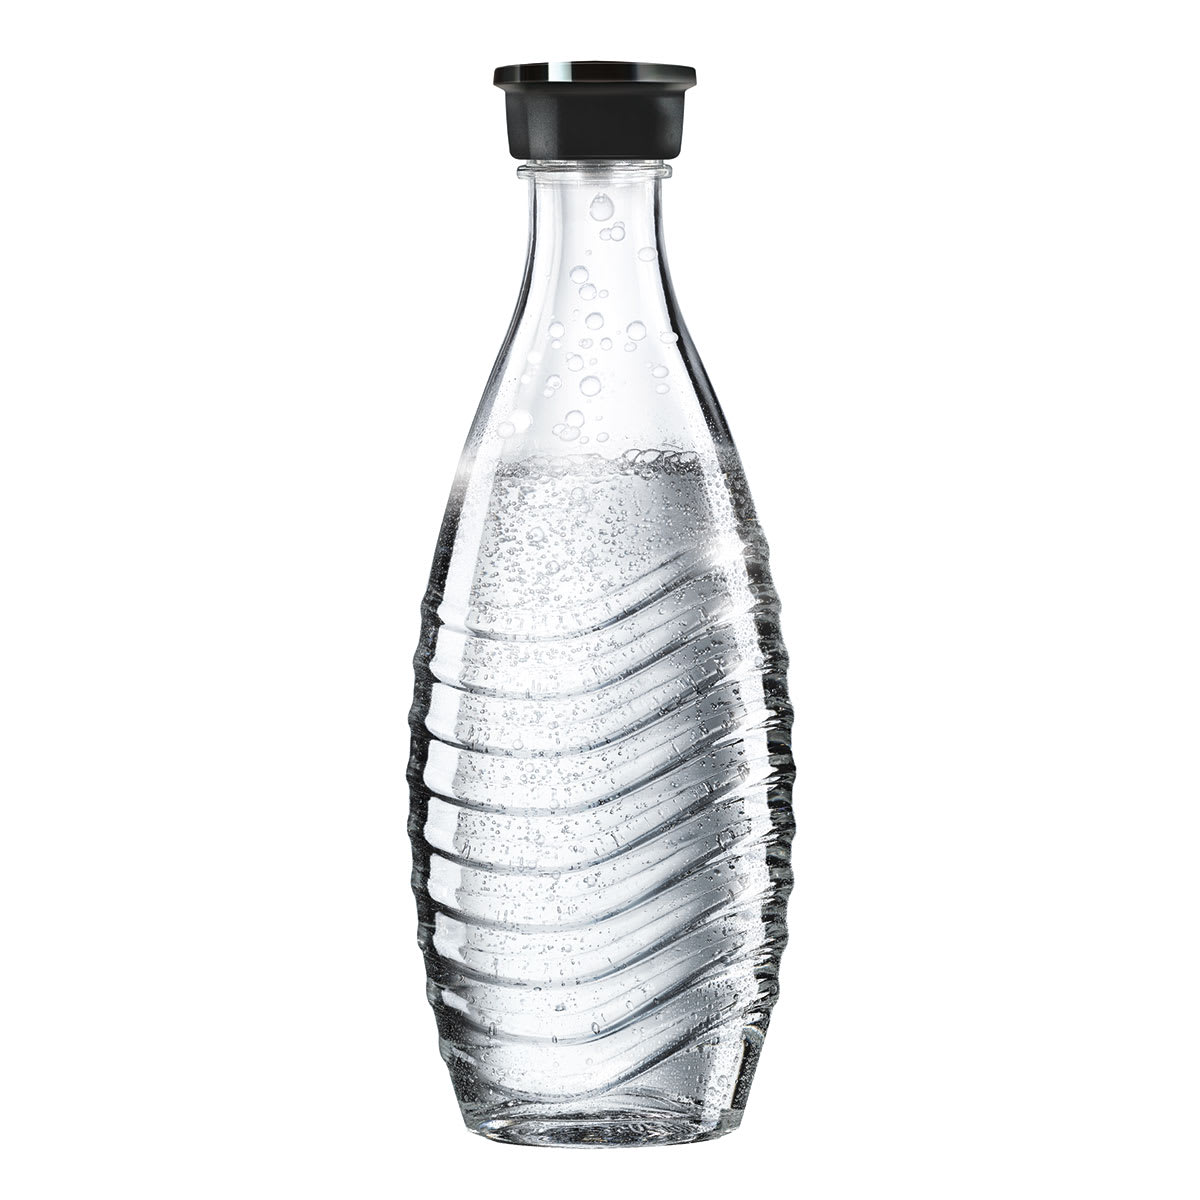 Passer til Sodastream Crystal